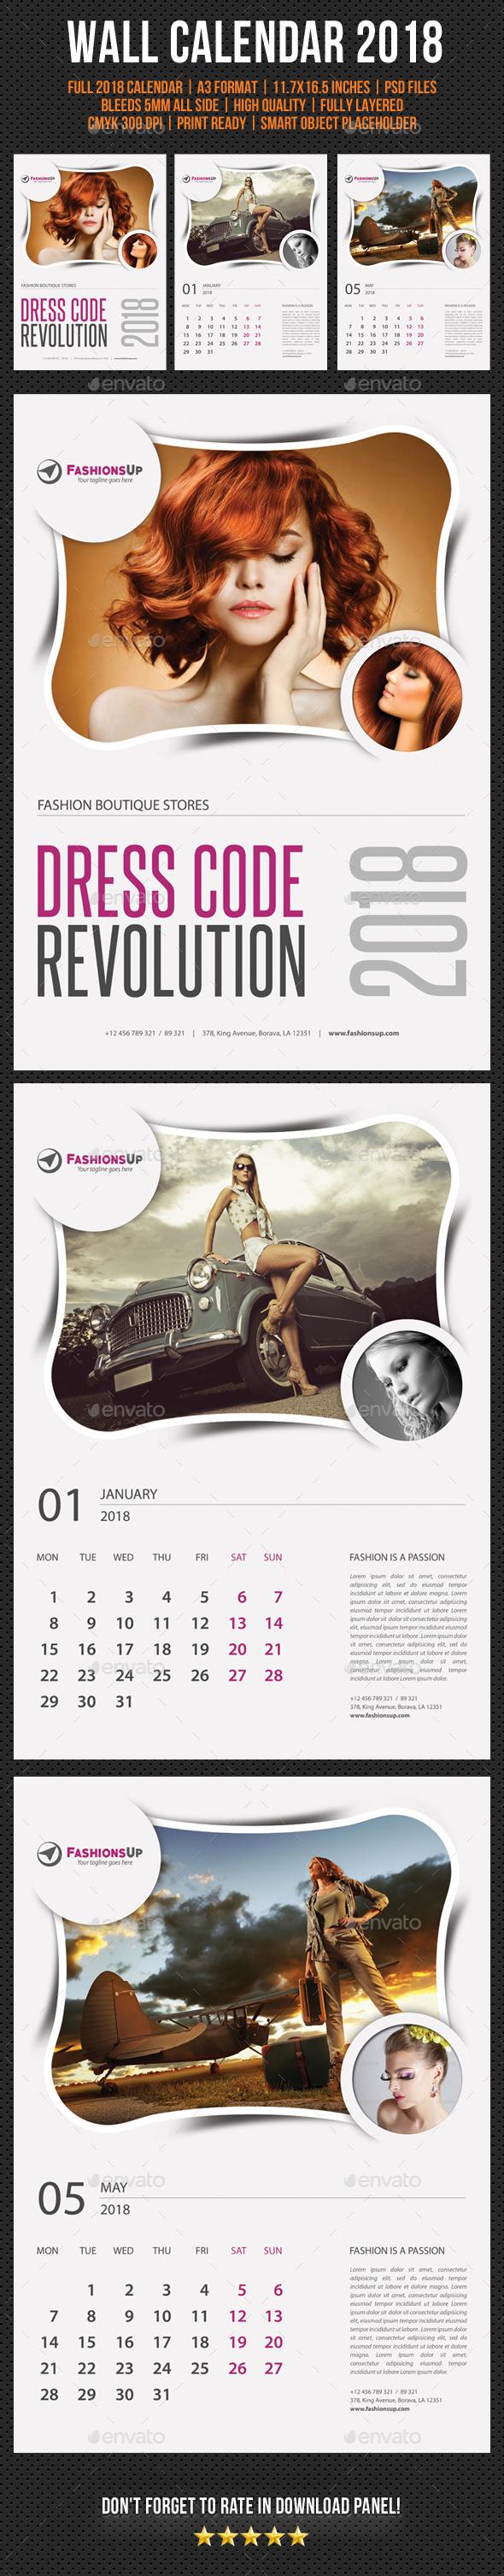 Wall Calendar 2018 V13 - Calendars Stationery